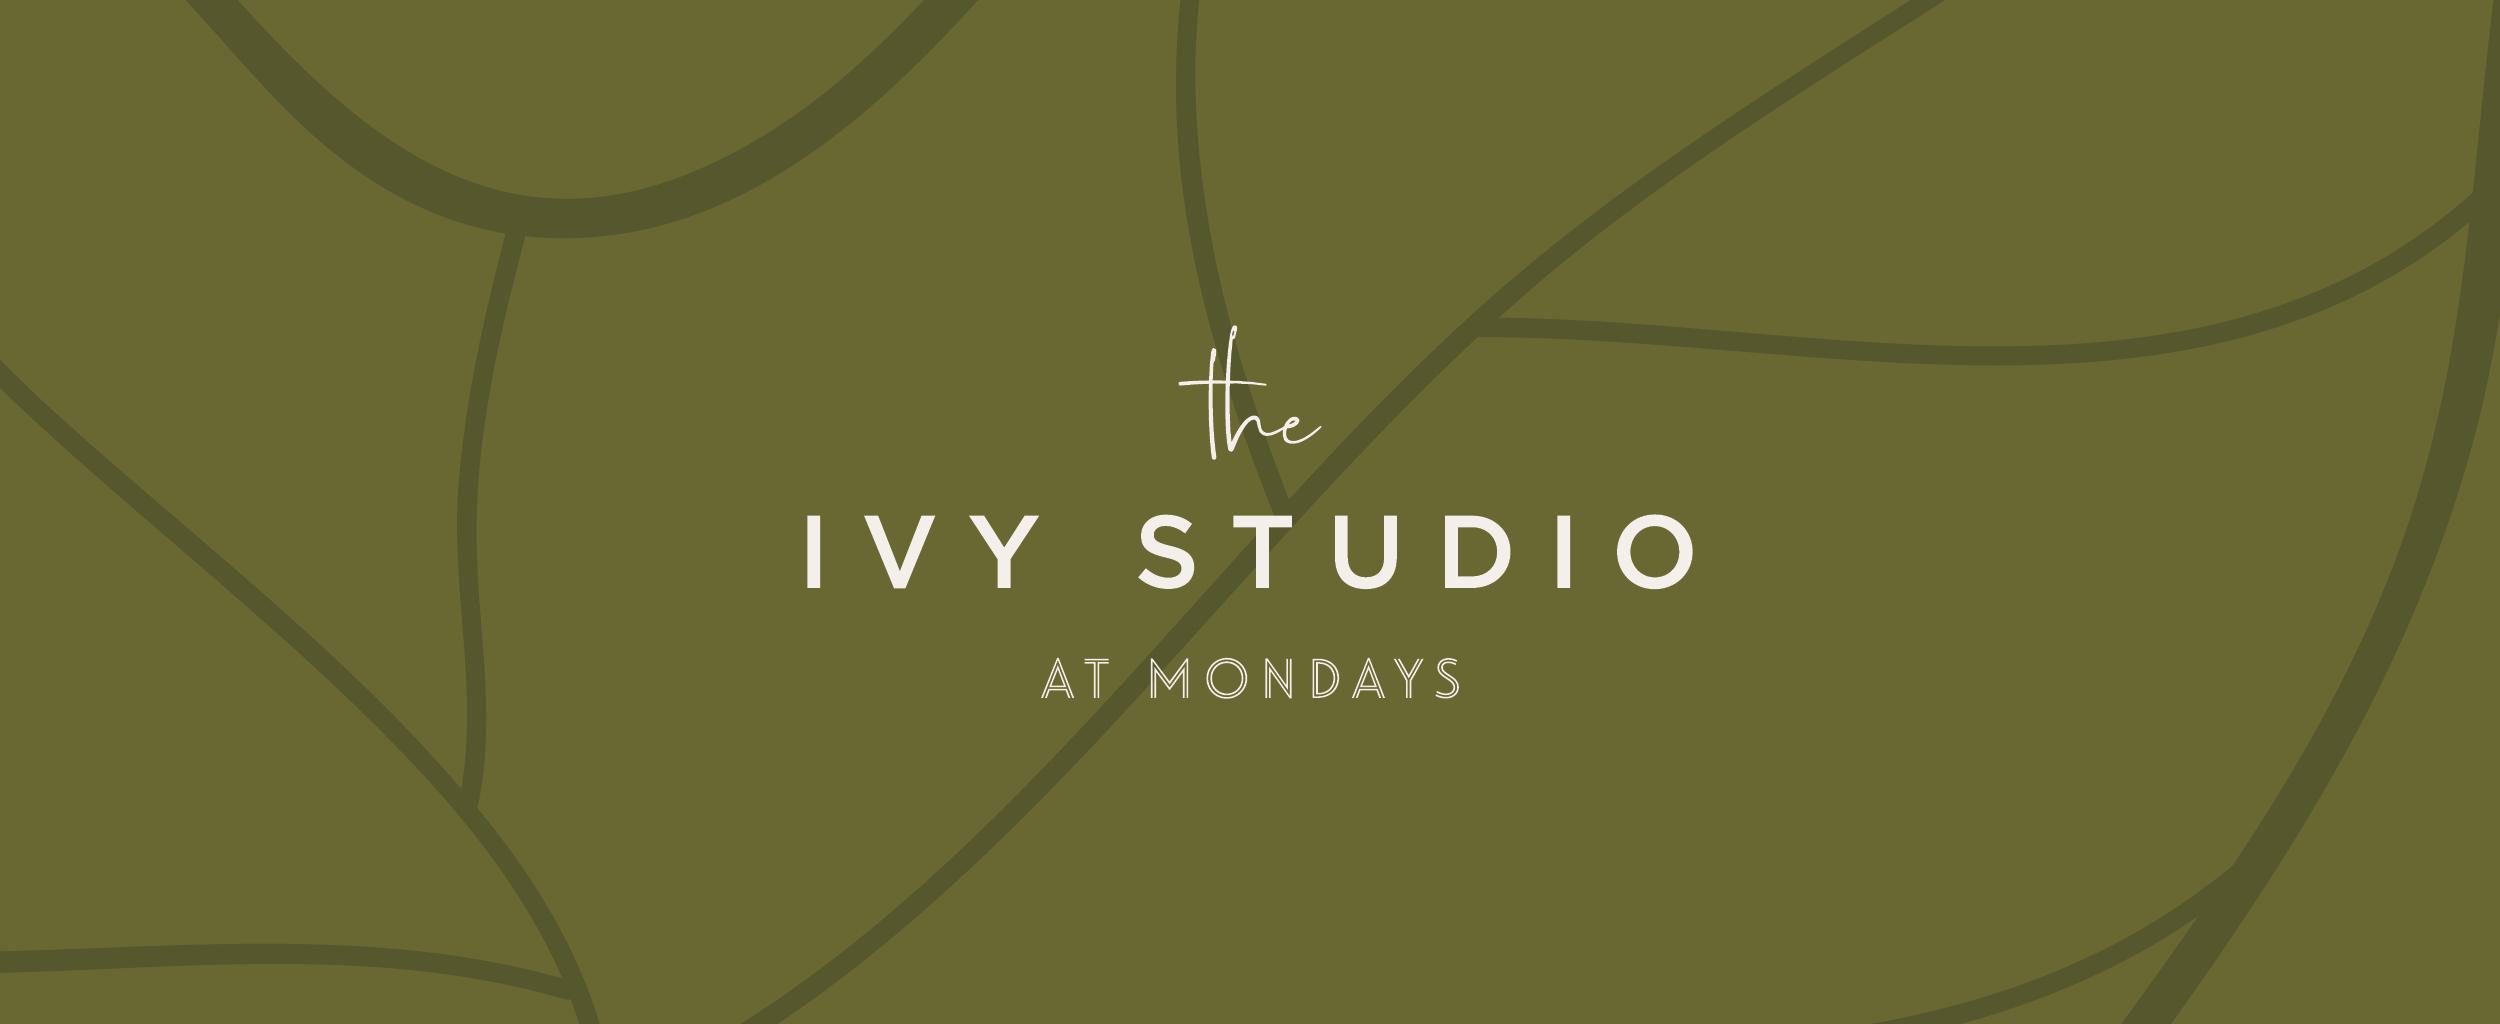 The Ivy Studio.png